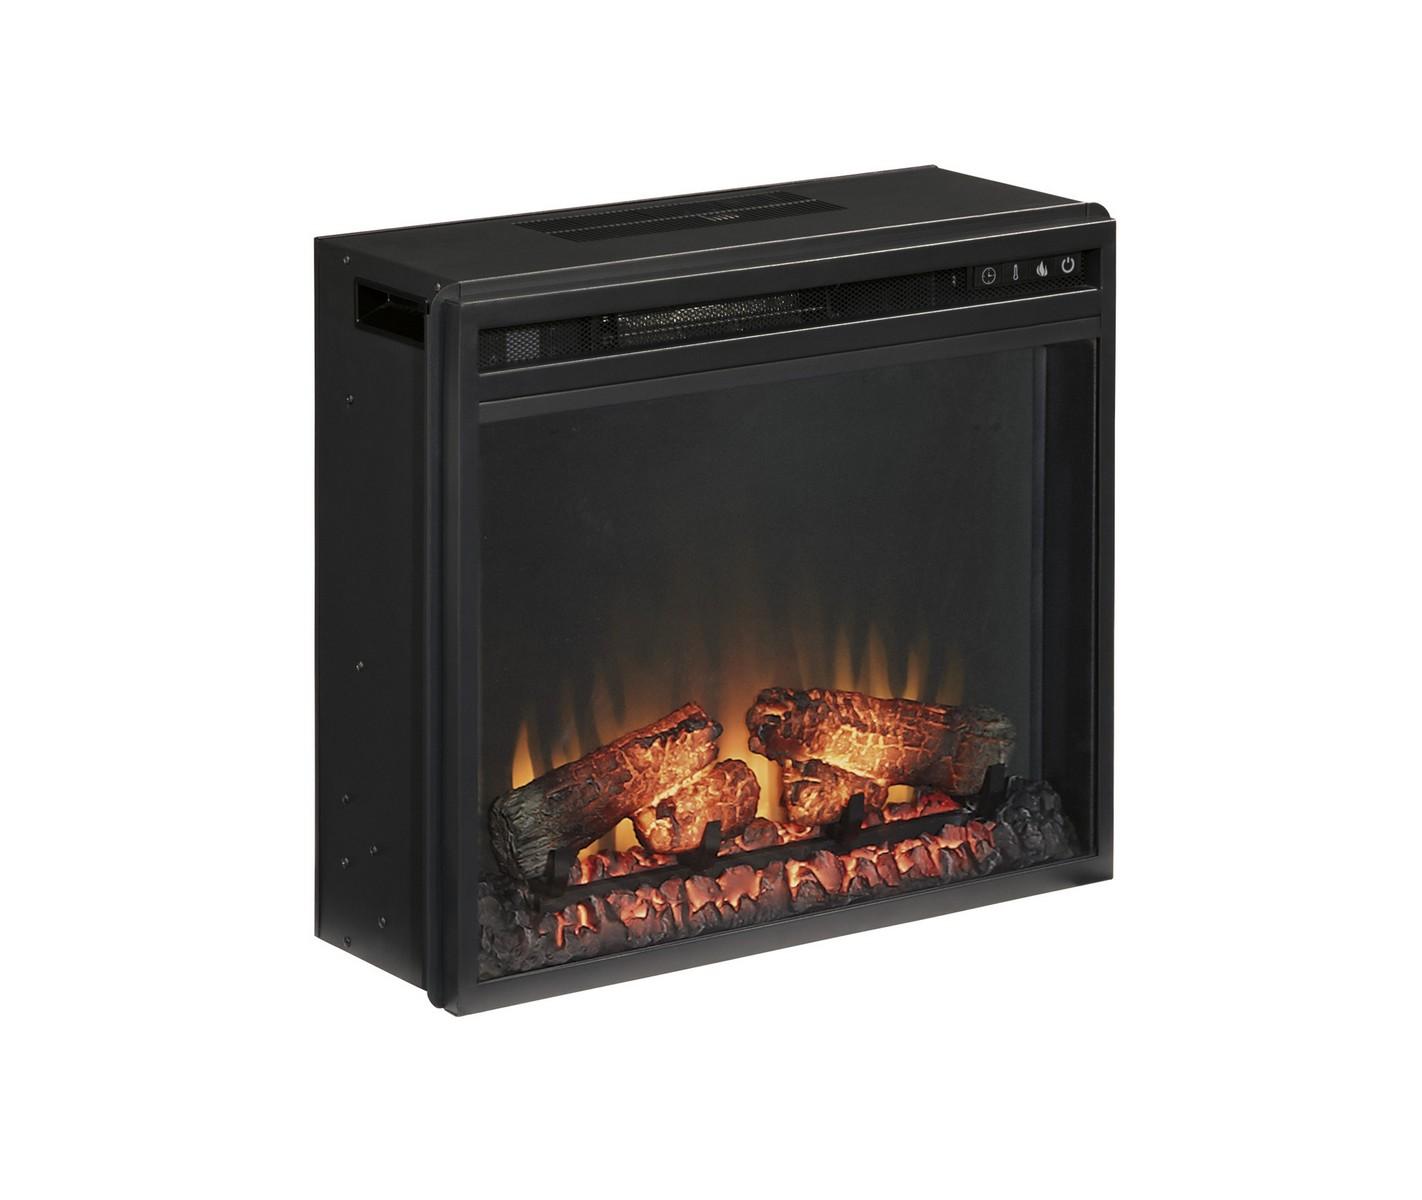 Ashley W100 Series Fireplace Insert